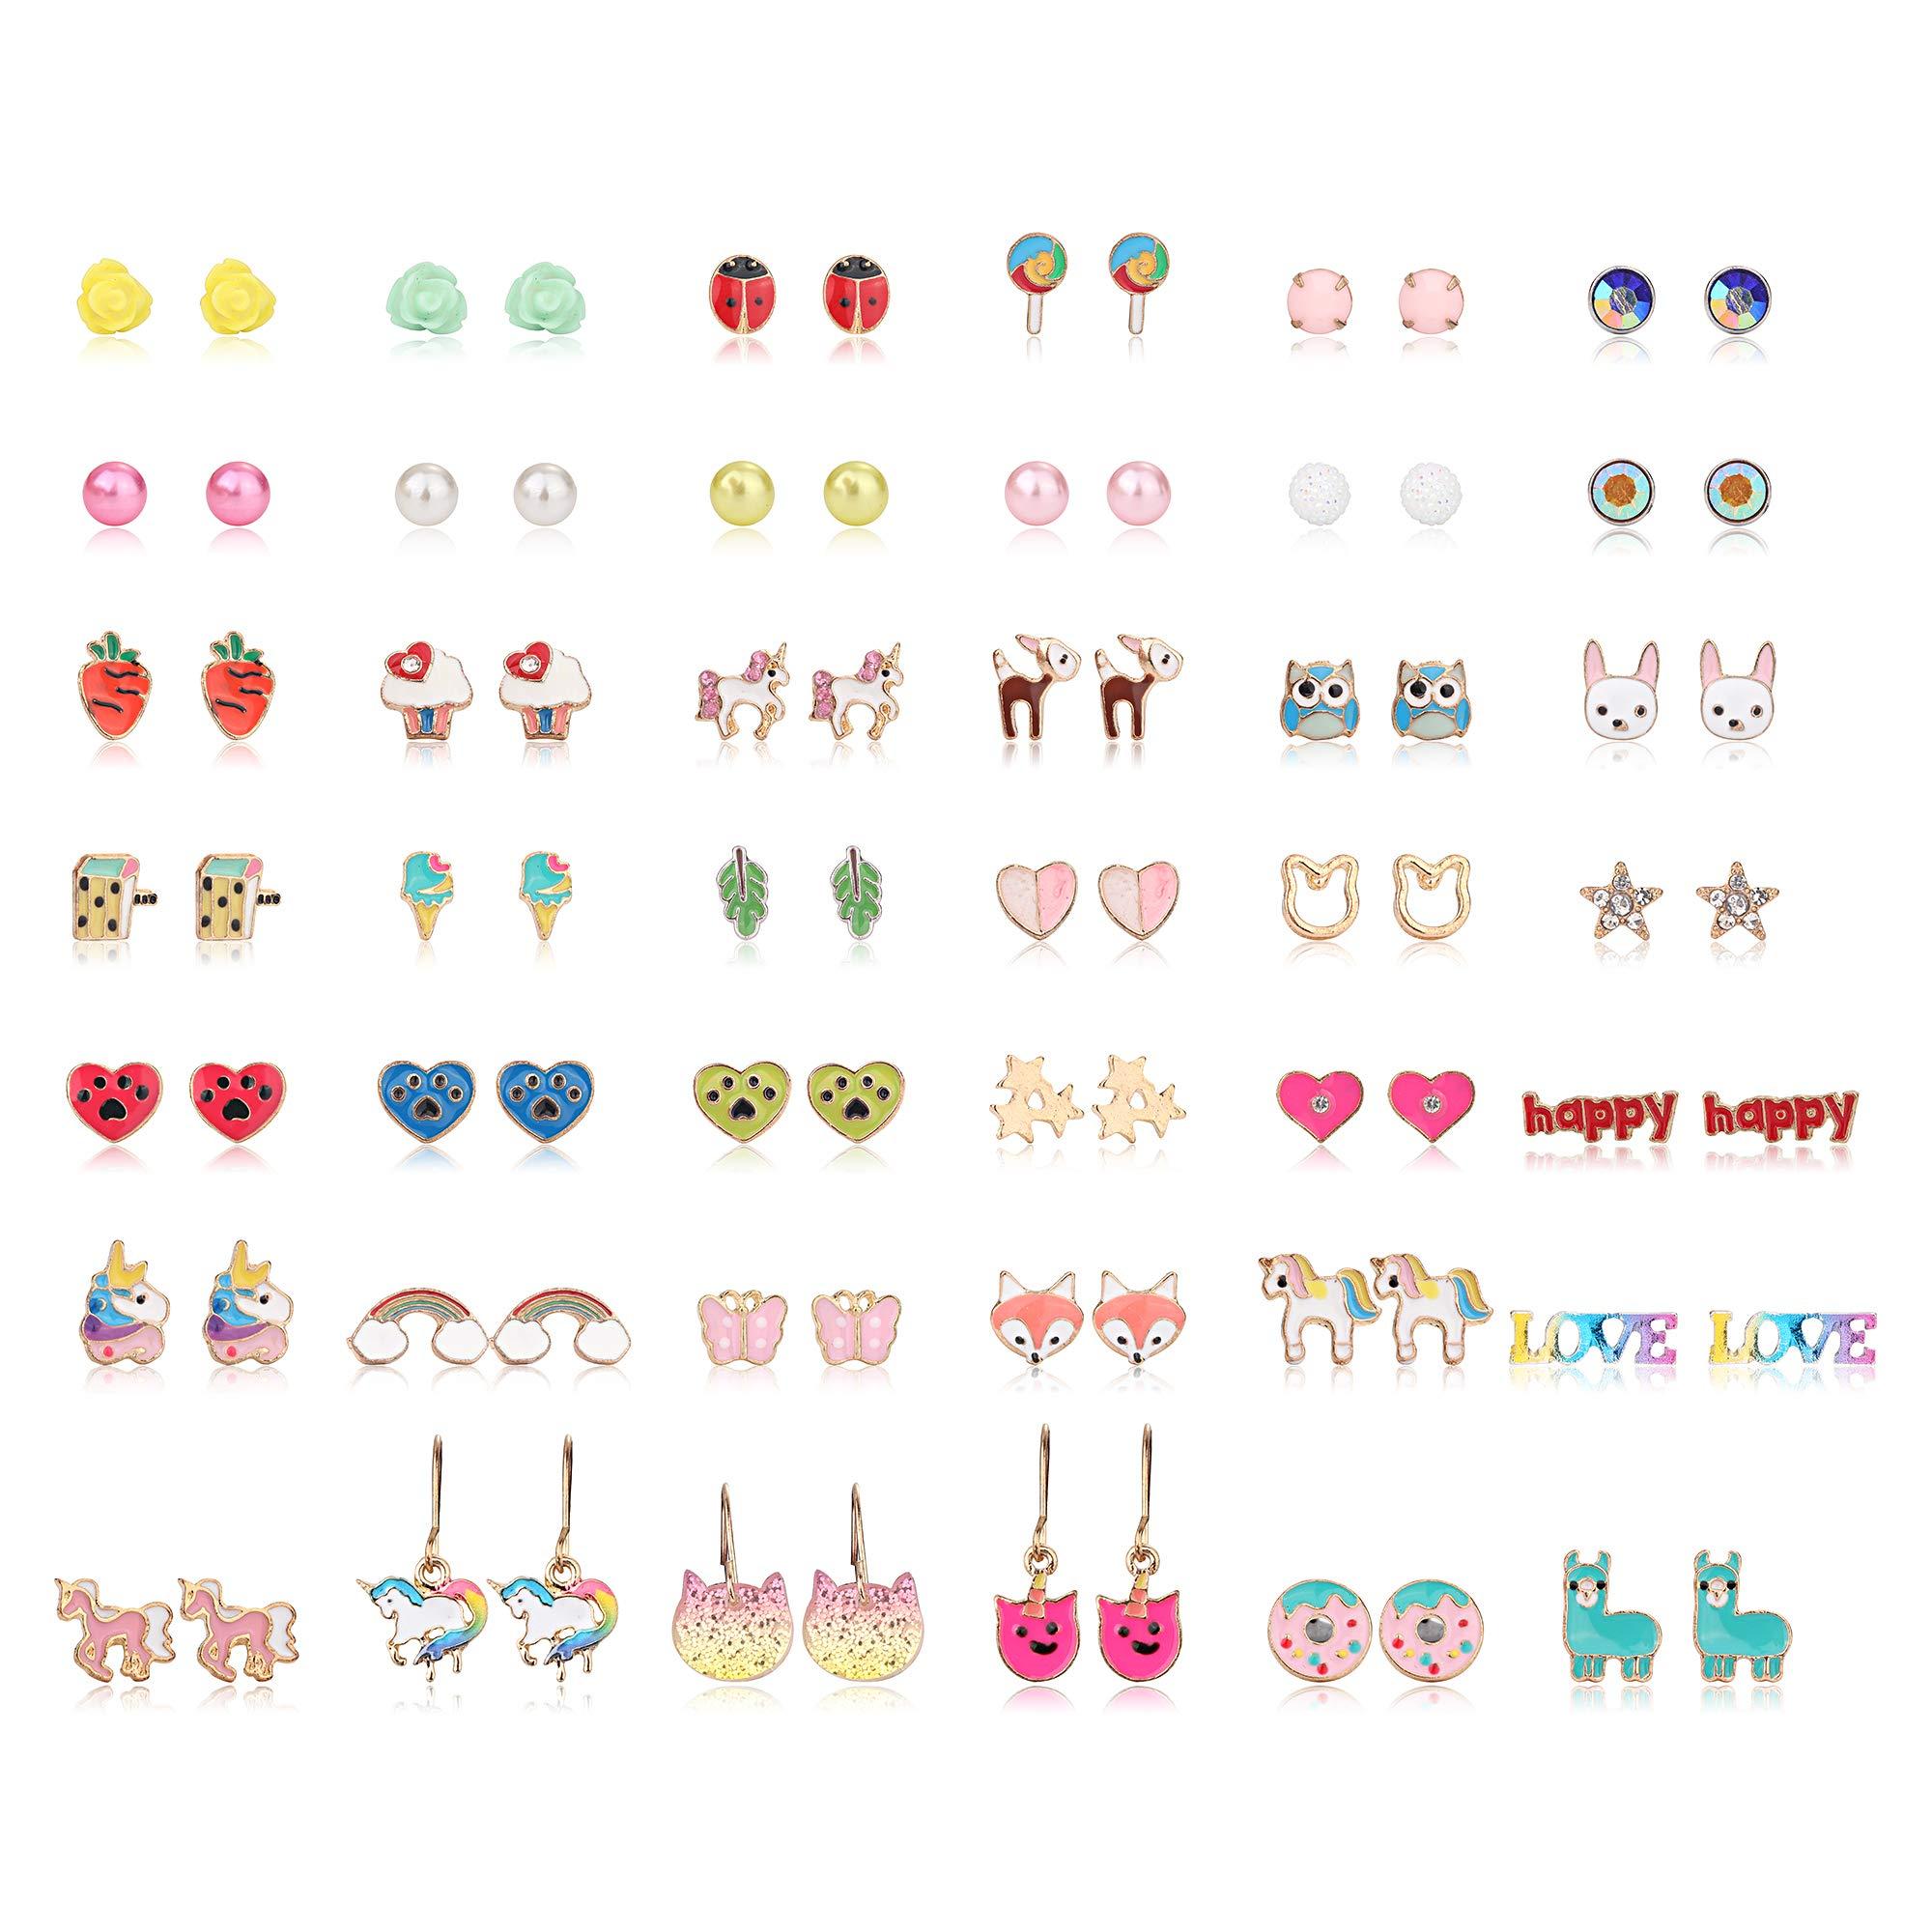 Hanpabum 42 Pairs Stainless Steel Earrings for Girls Women Flower CZ Animals Heart Ice Cream Colorful Cute Stud Earrings set by Hanpabum